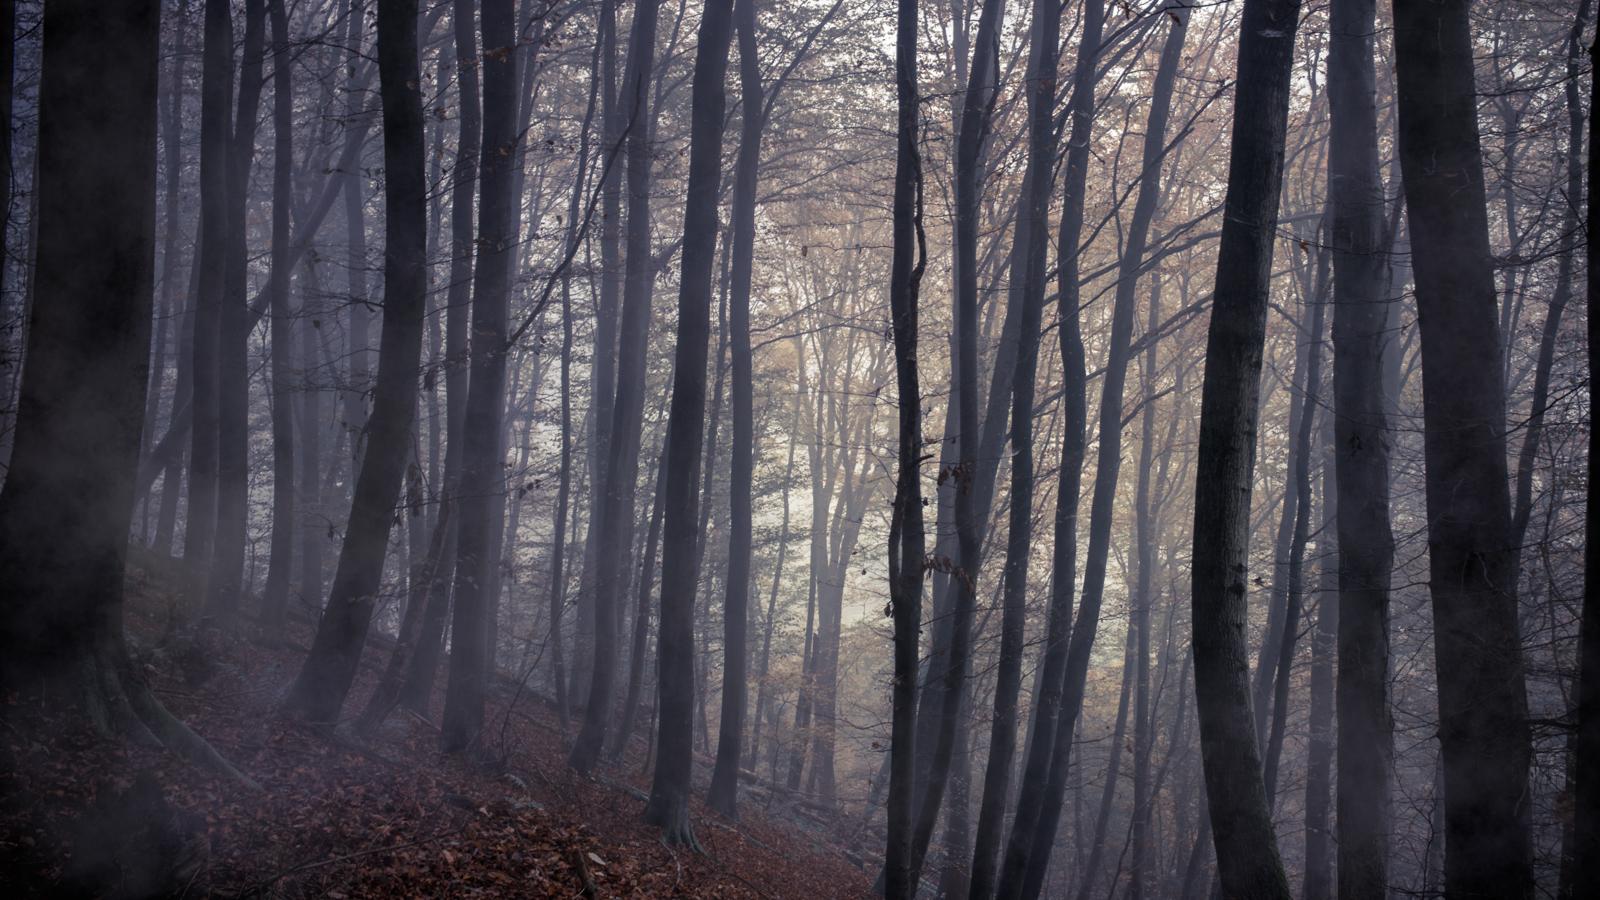 Zsofia_Daniel_Trees-6.jpg